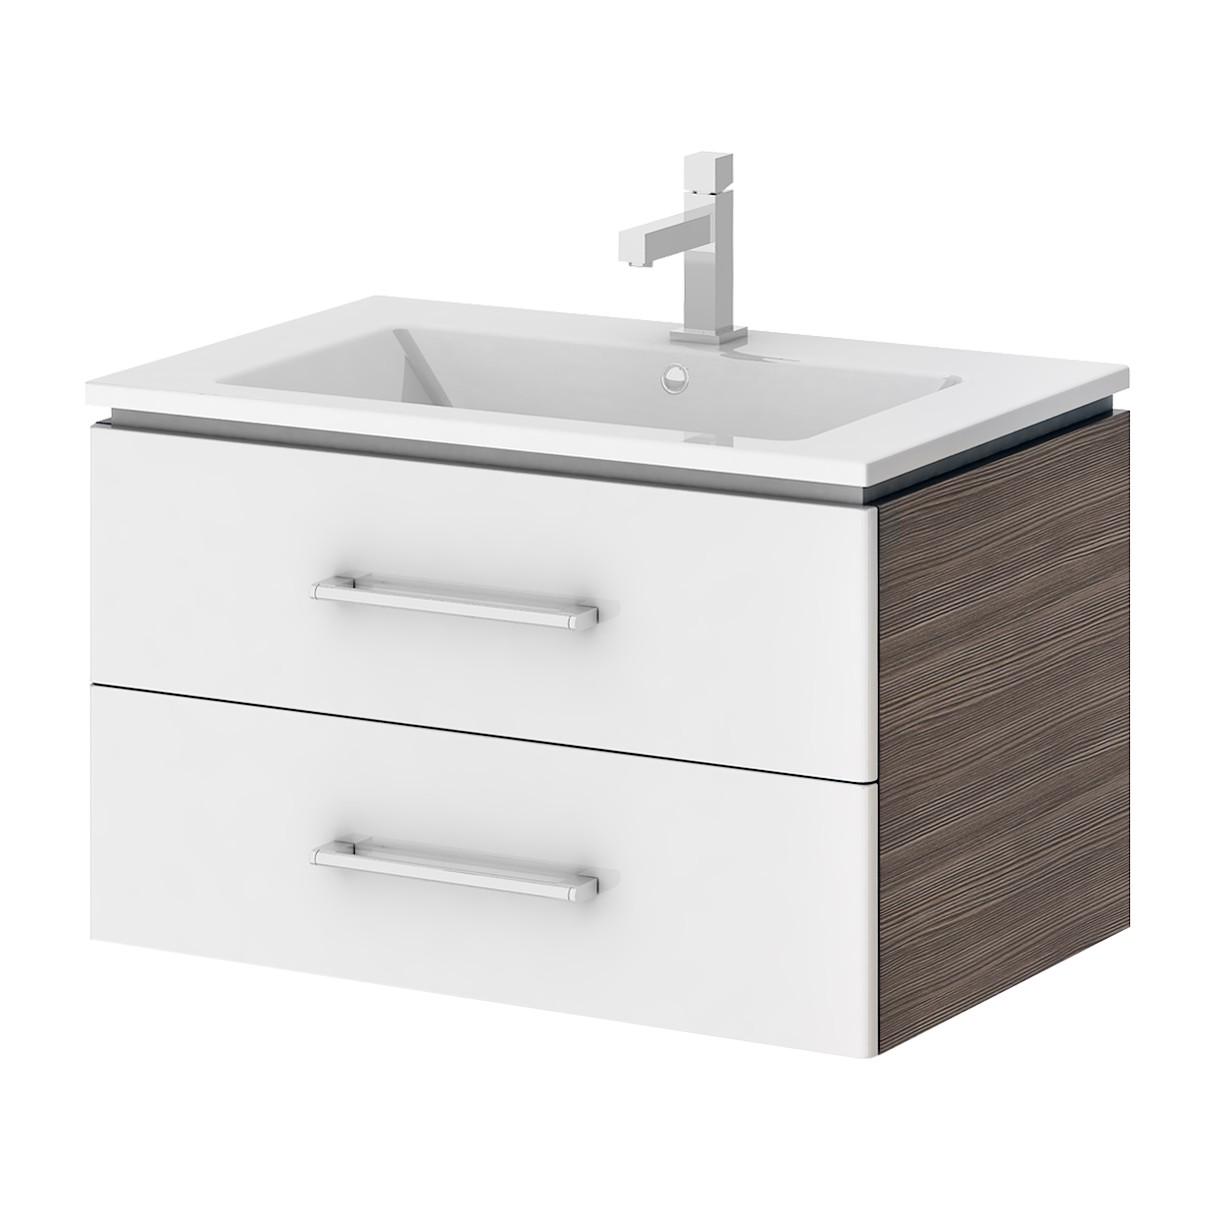 preisvergleich eu waschtisch weiss 75. Black Bedroom Furniture Sets. Home Design Ideas